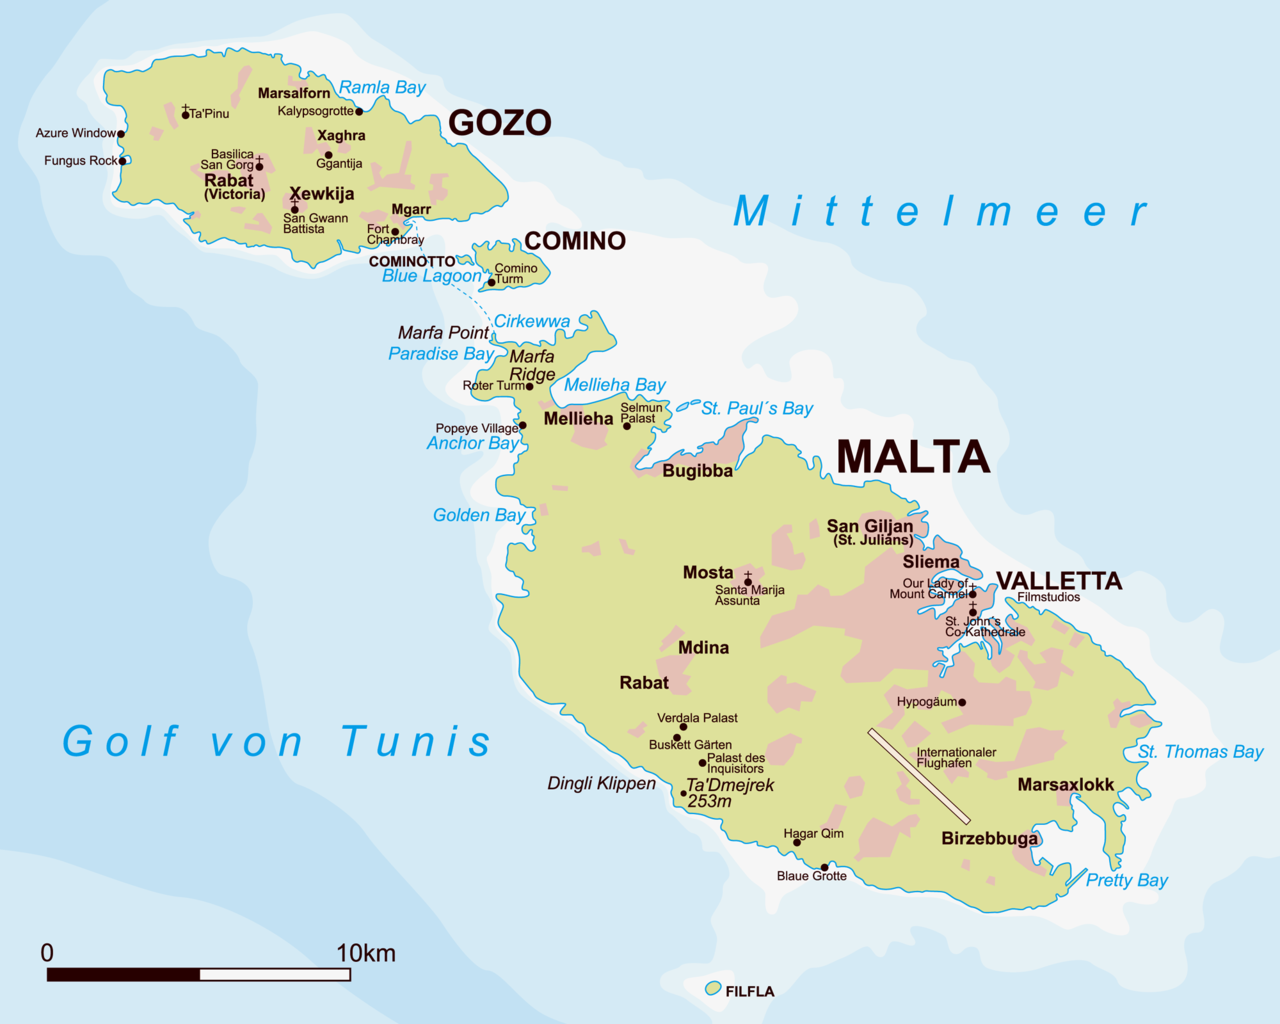 Malta Gozo Map File:Malta Gozo Comino.png   Wikimedia Commons